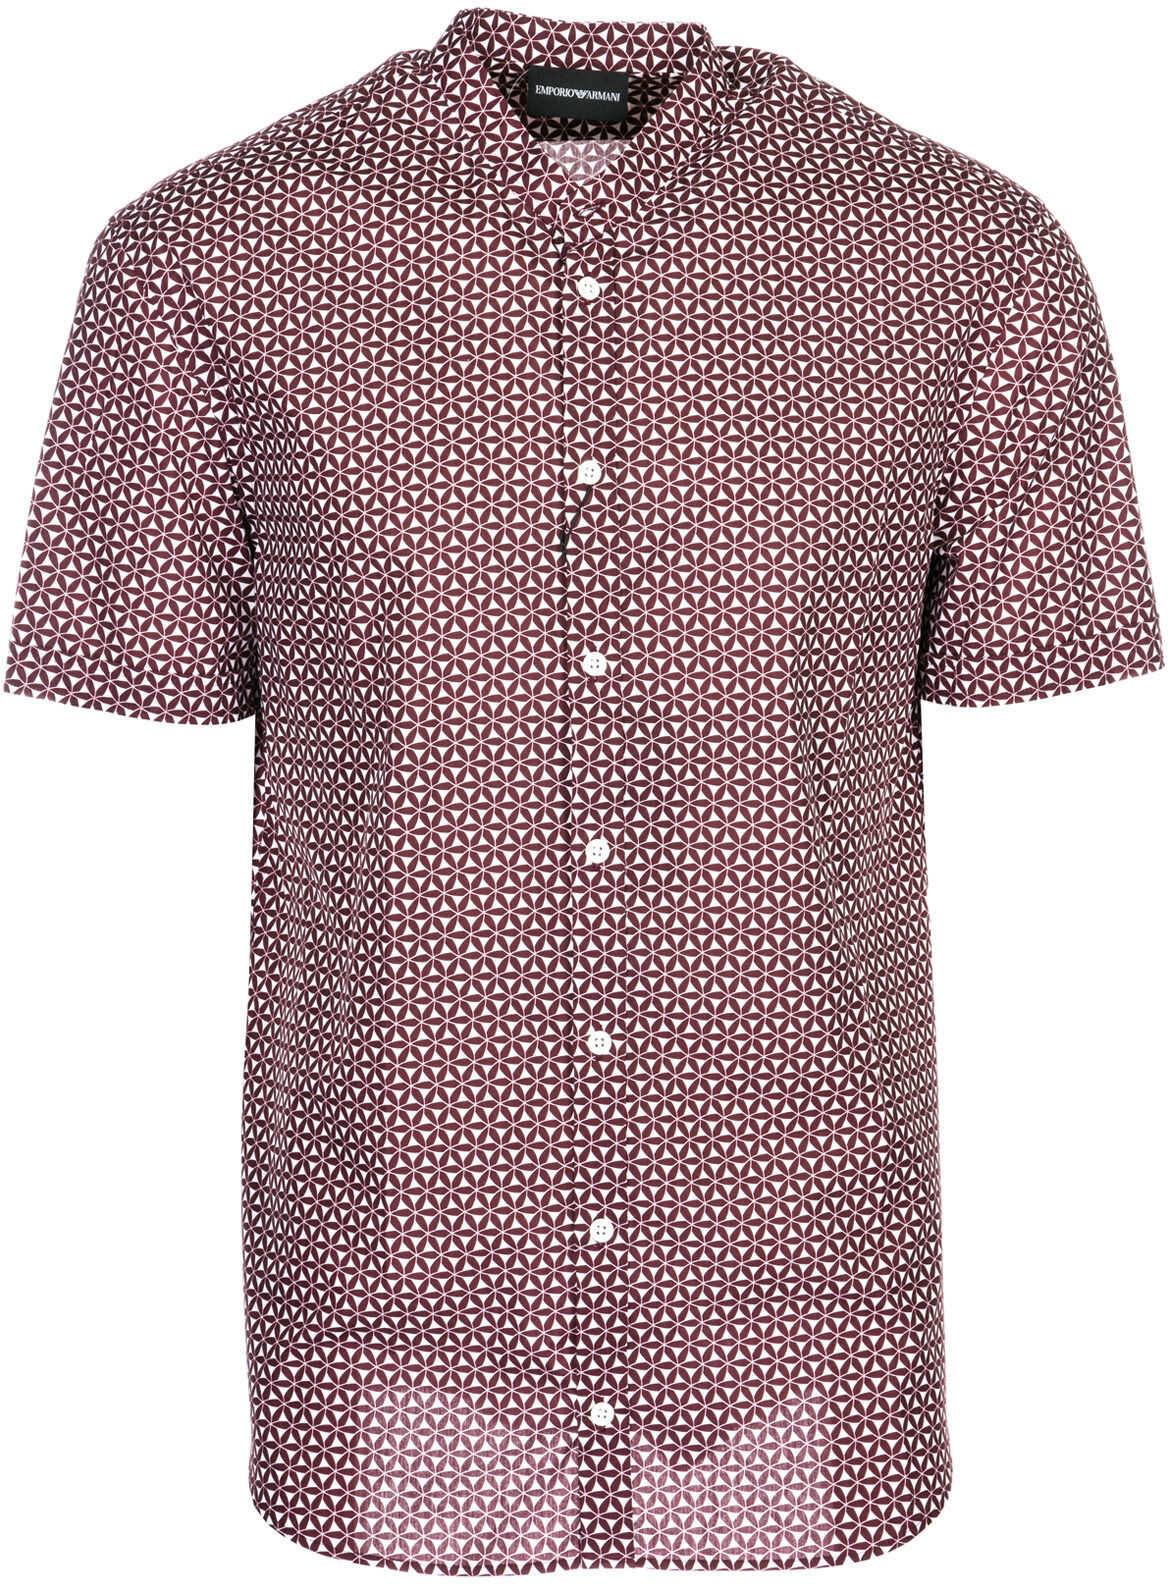 Emporio Armani Short Sleeve Shirt T-Shirt Red